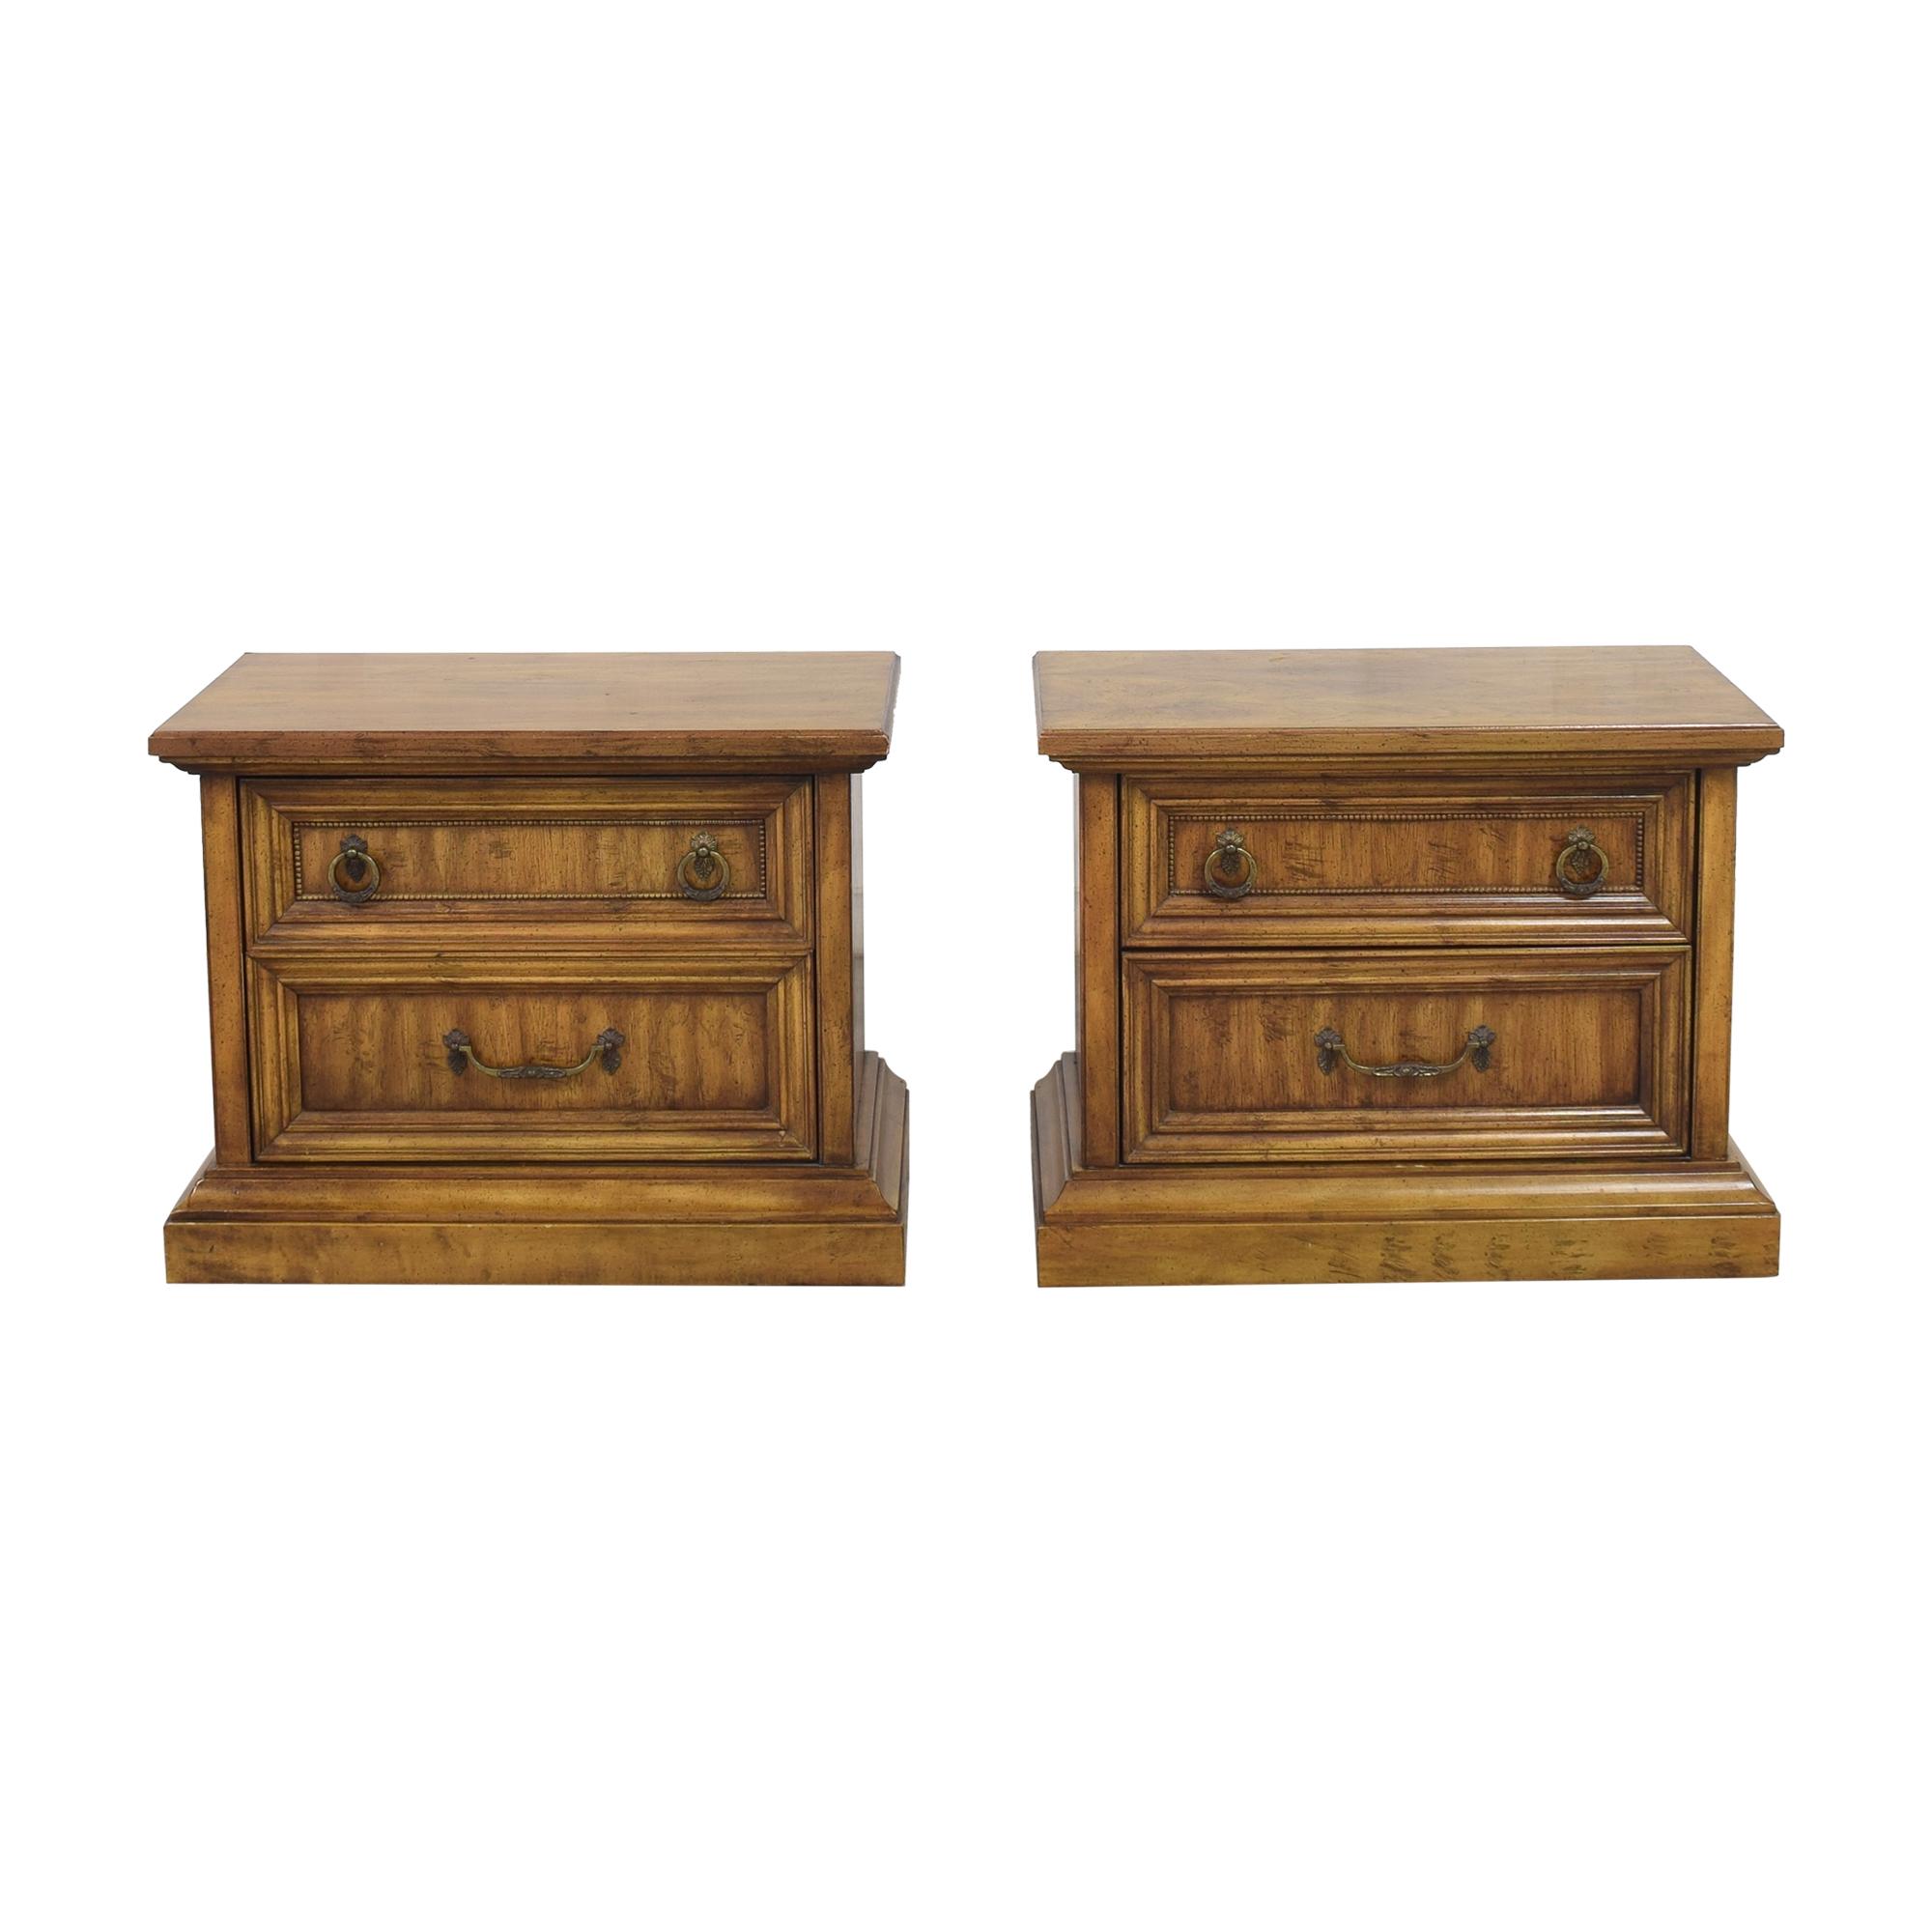 Stanley Furniture Stanley Furniture Two Drawer Nightstands nj